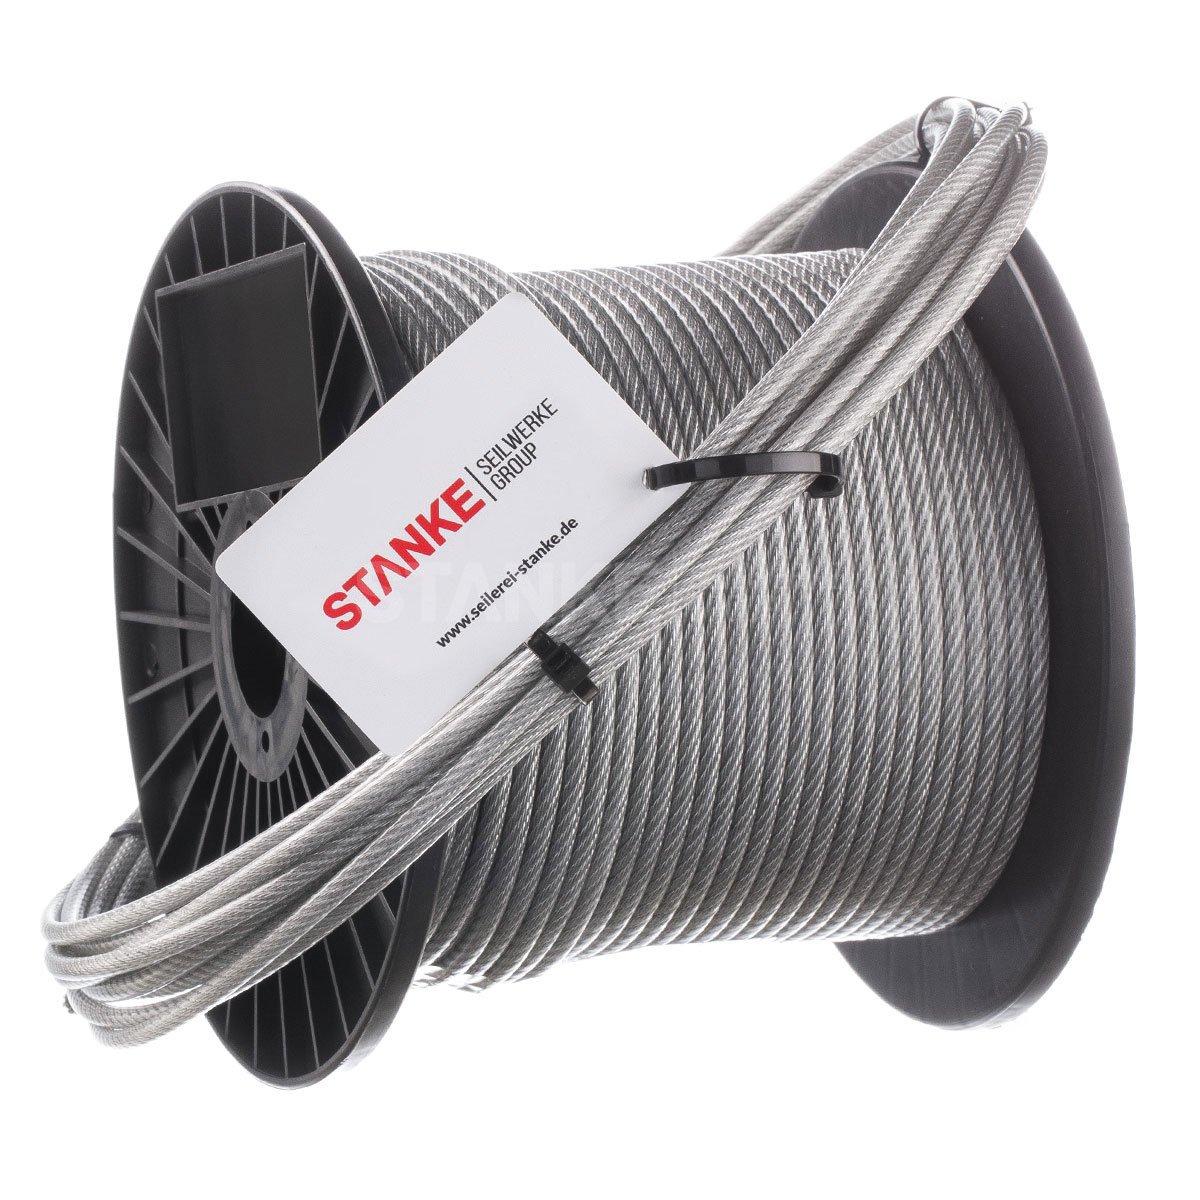 Stahlseil 5mm PVC ummantelt | Jumbo-Shop